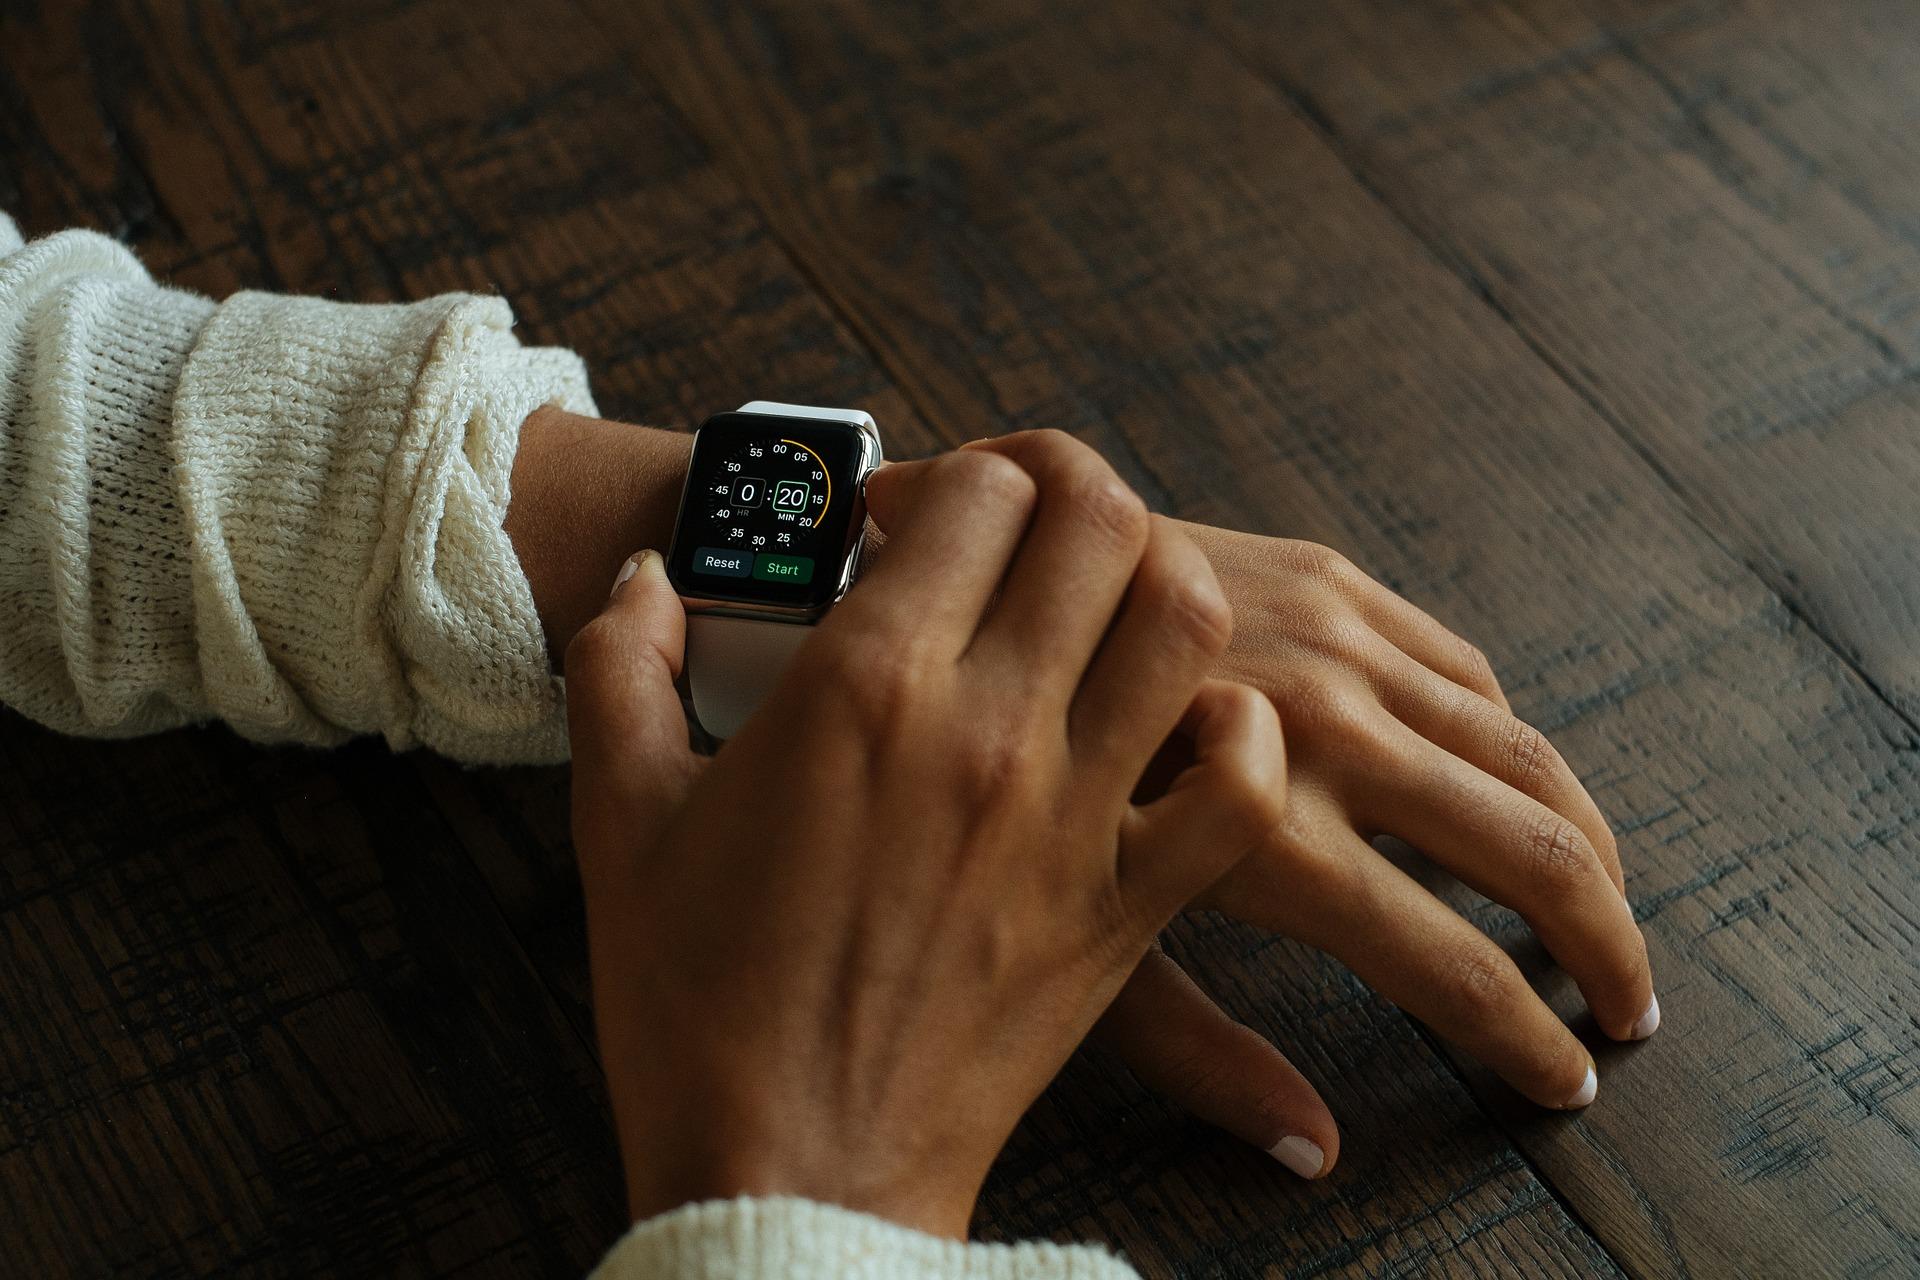 smart-watch-821558_1920